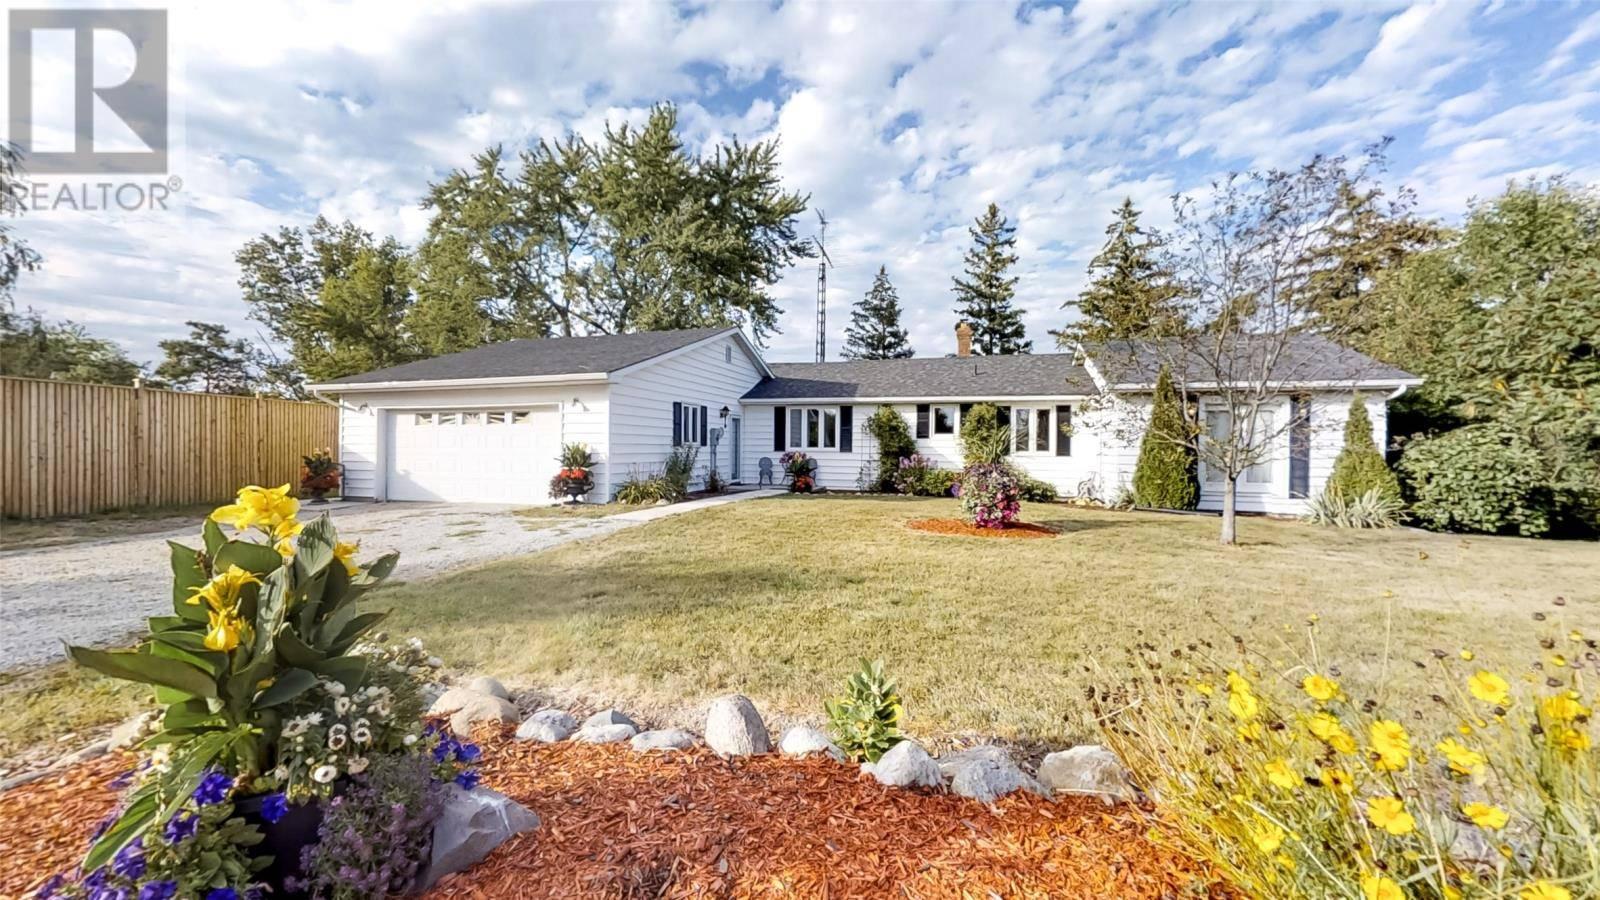 House for sale at 4376 Lambton Ln Plympton-wyoming Ontario - MLS: 19027149